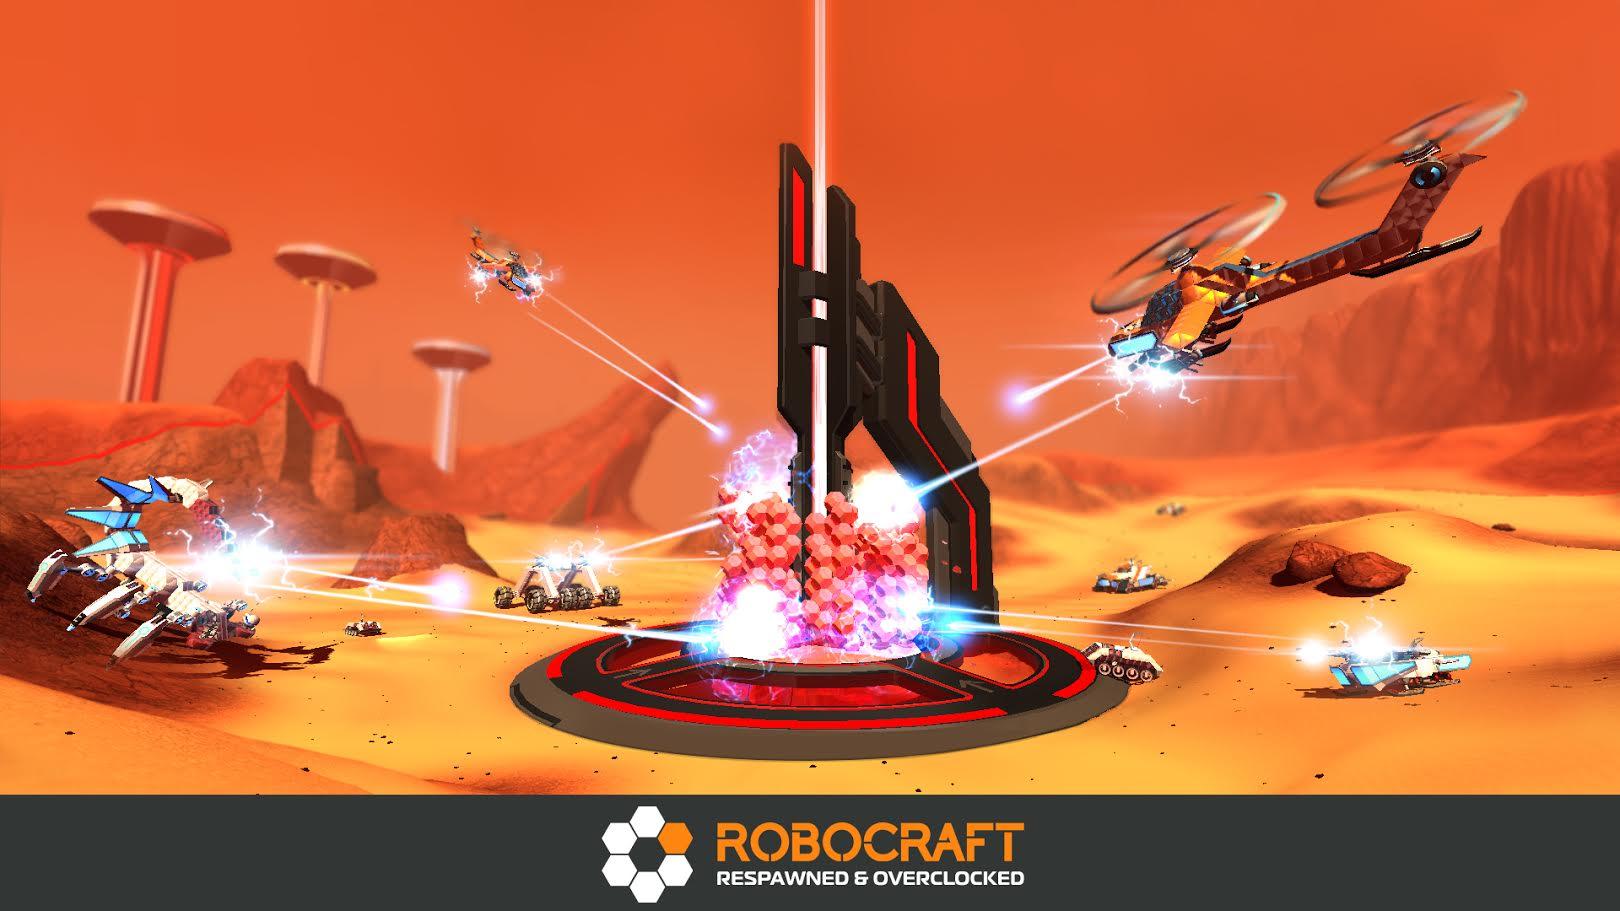 curse voice for robocraft